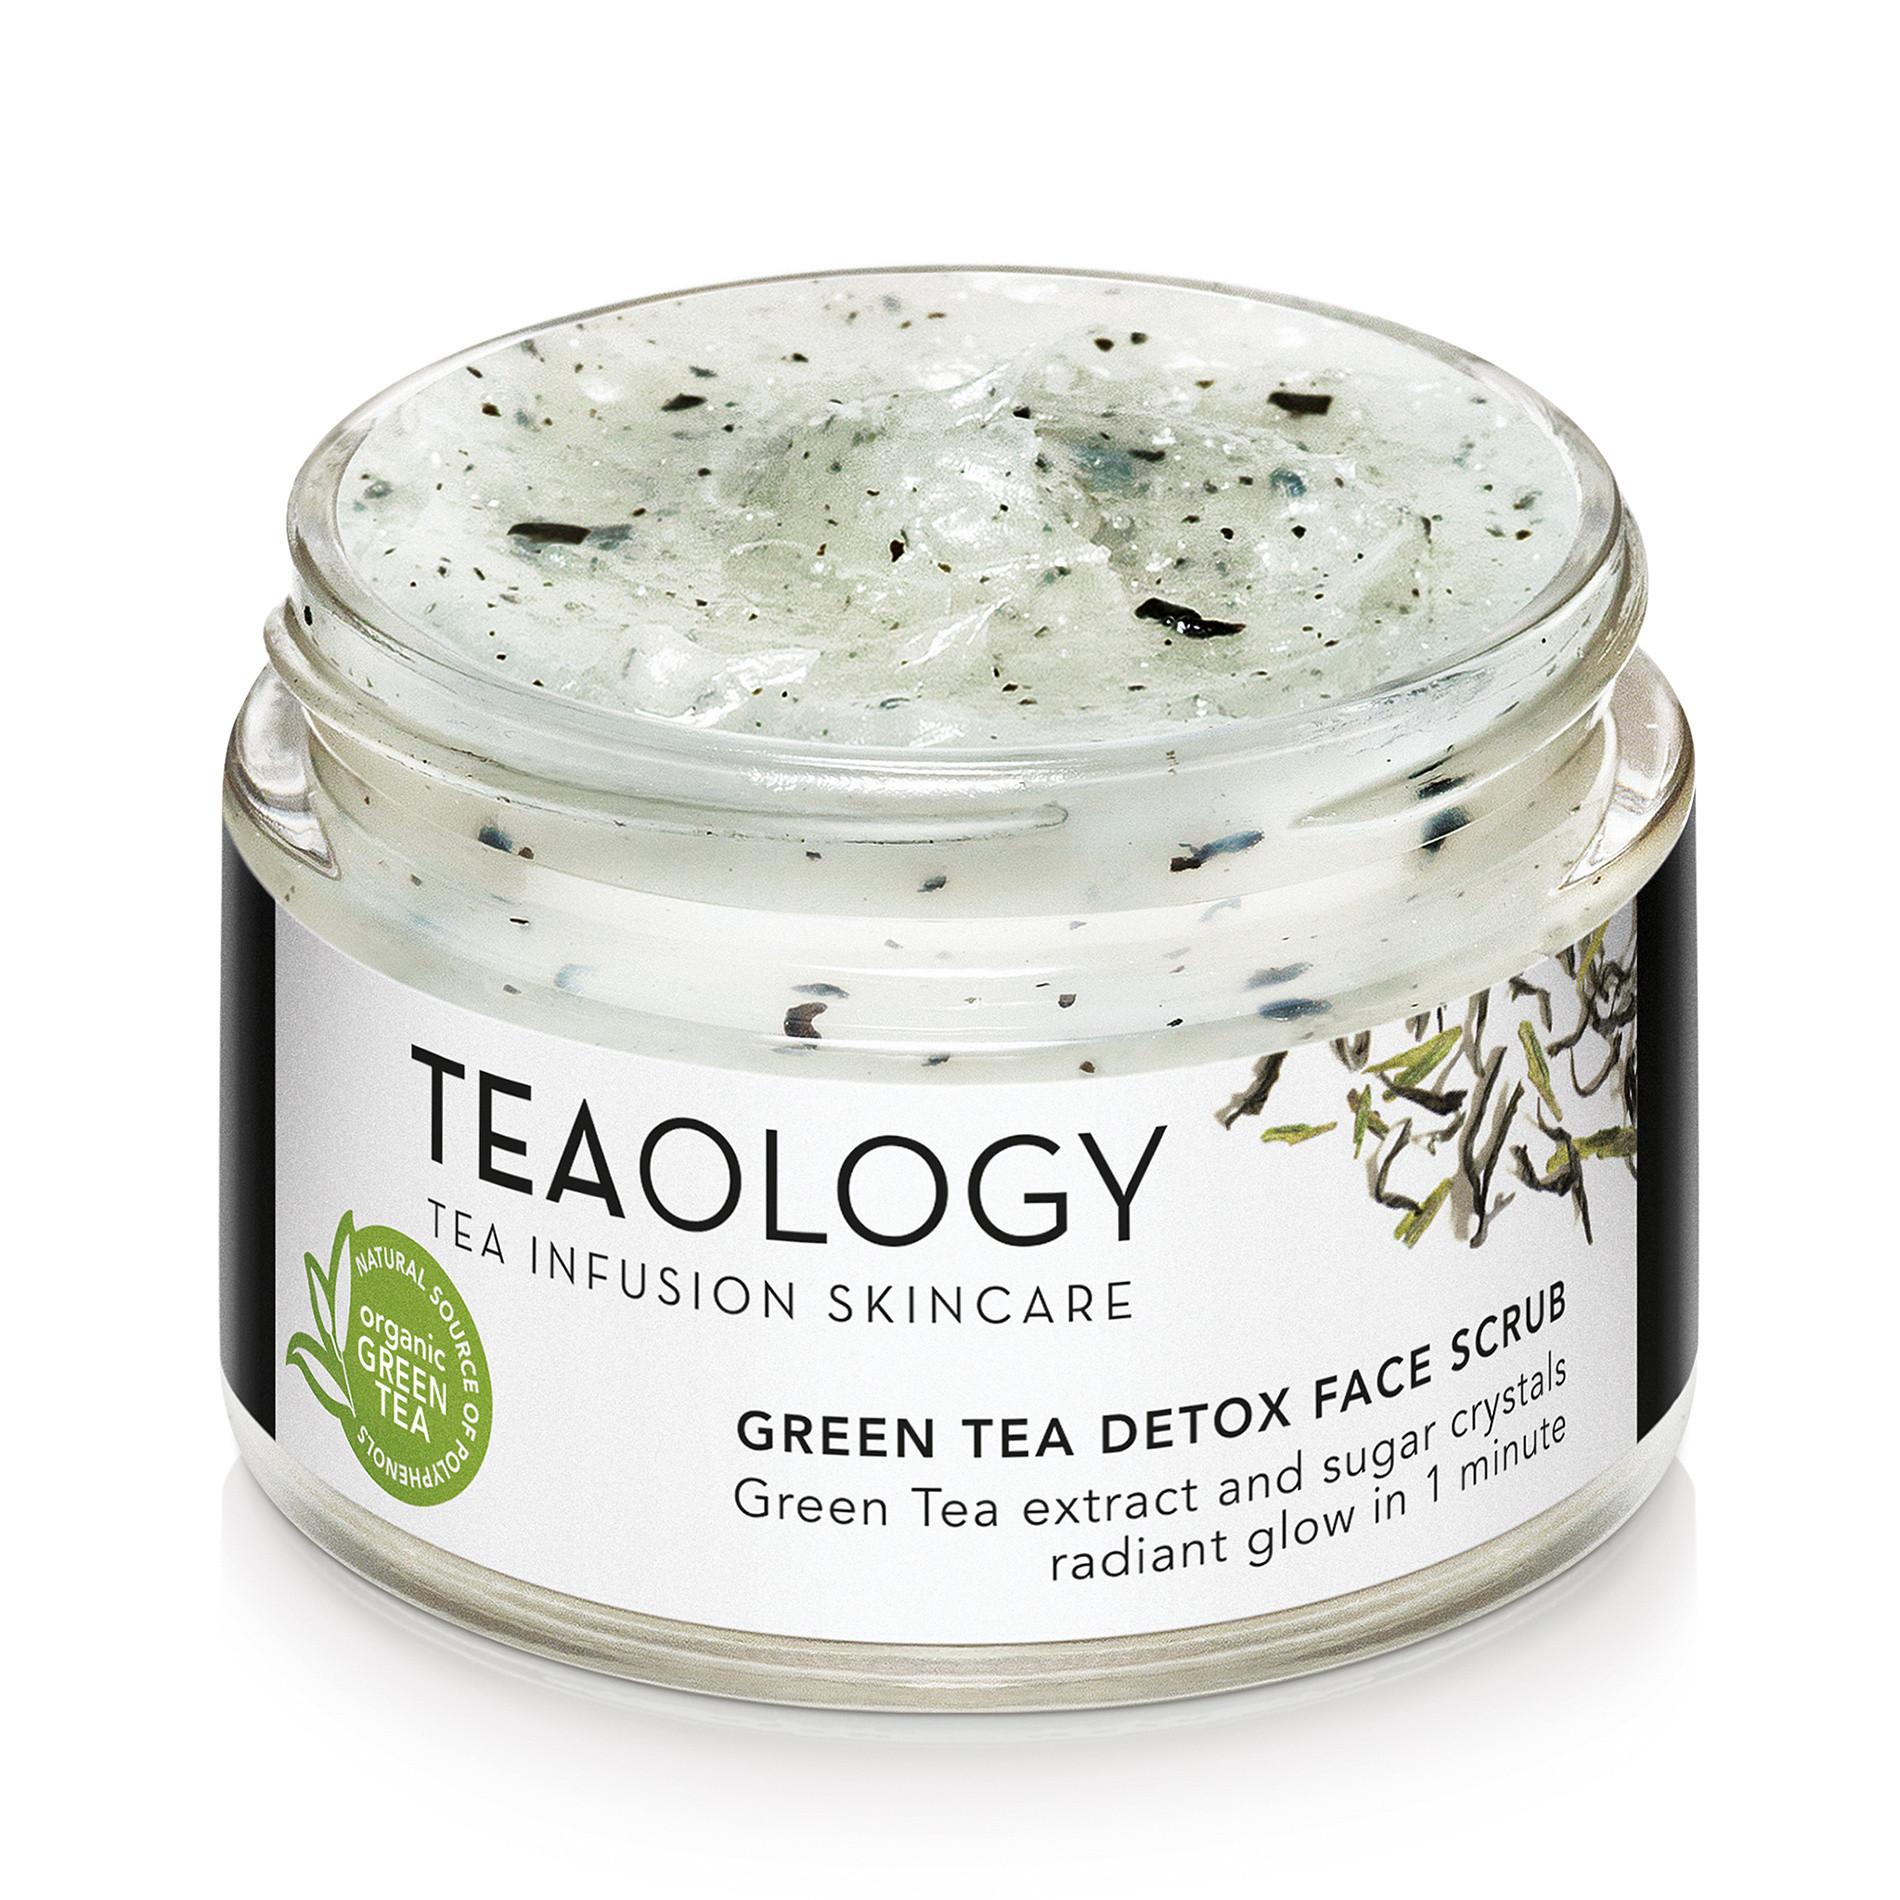 Teaology Green Tea Detox Face Scrub 50 ml, Bianco, large image number 0